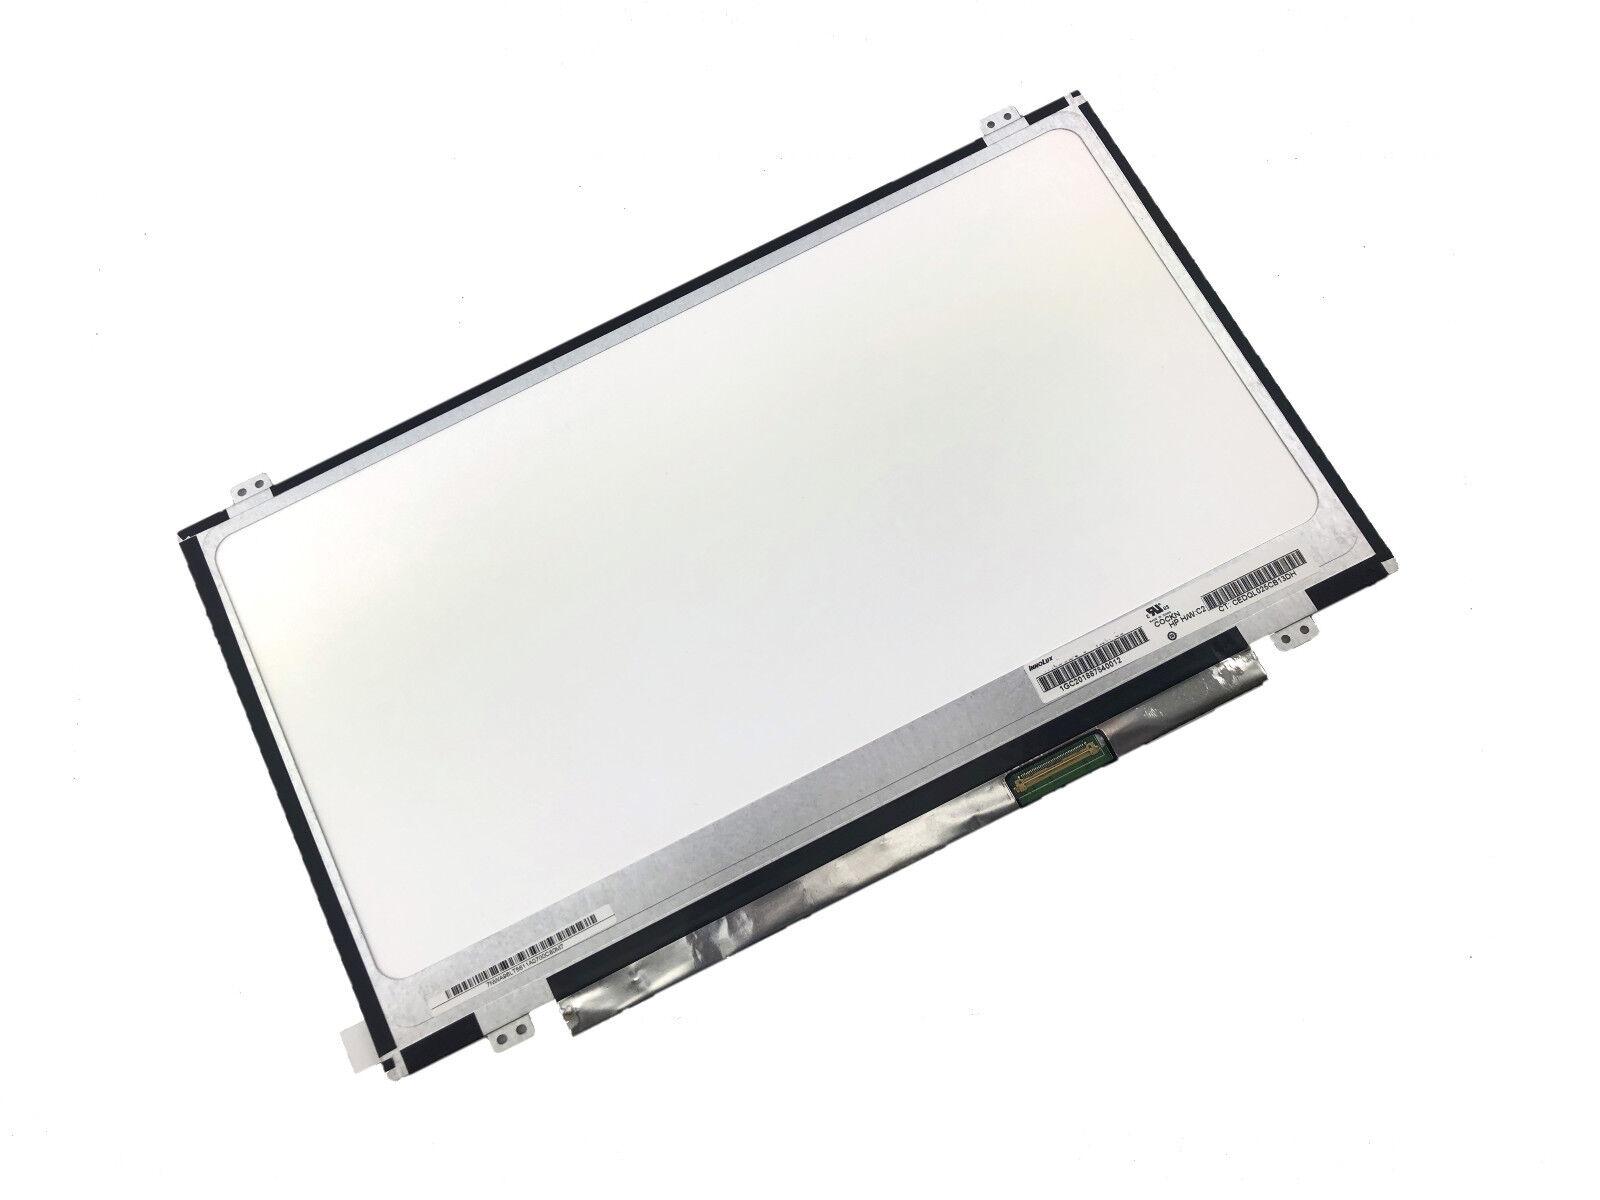 LAPTOP LCD SCREEN FOR IVO M140NWR1 14.0 WXGA HD